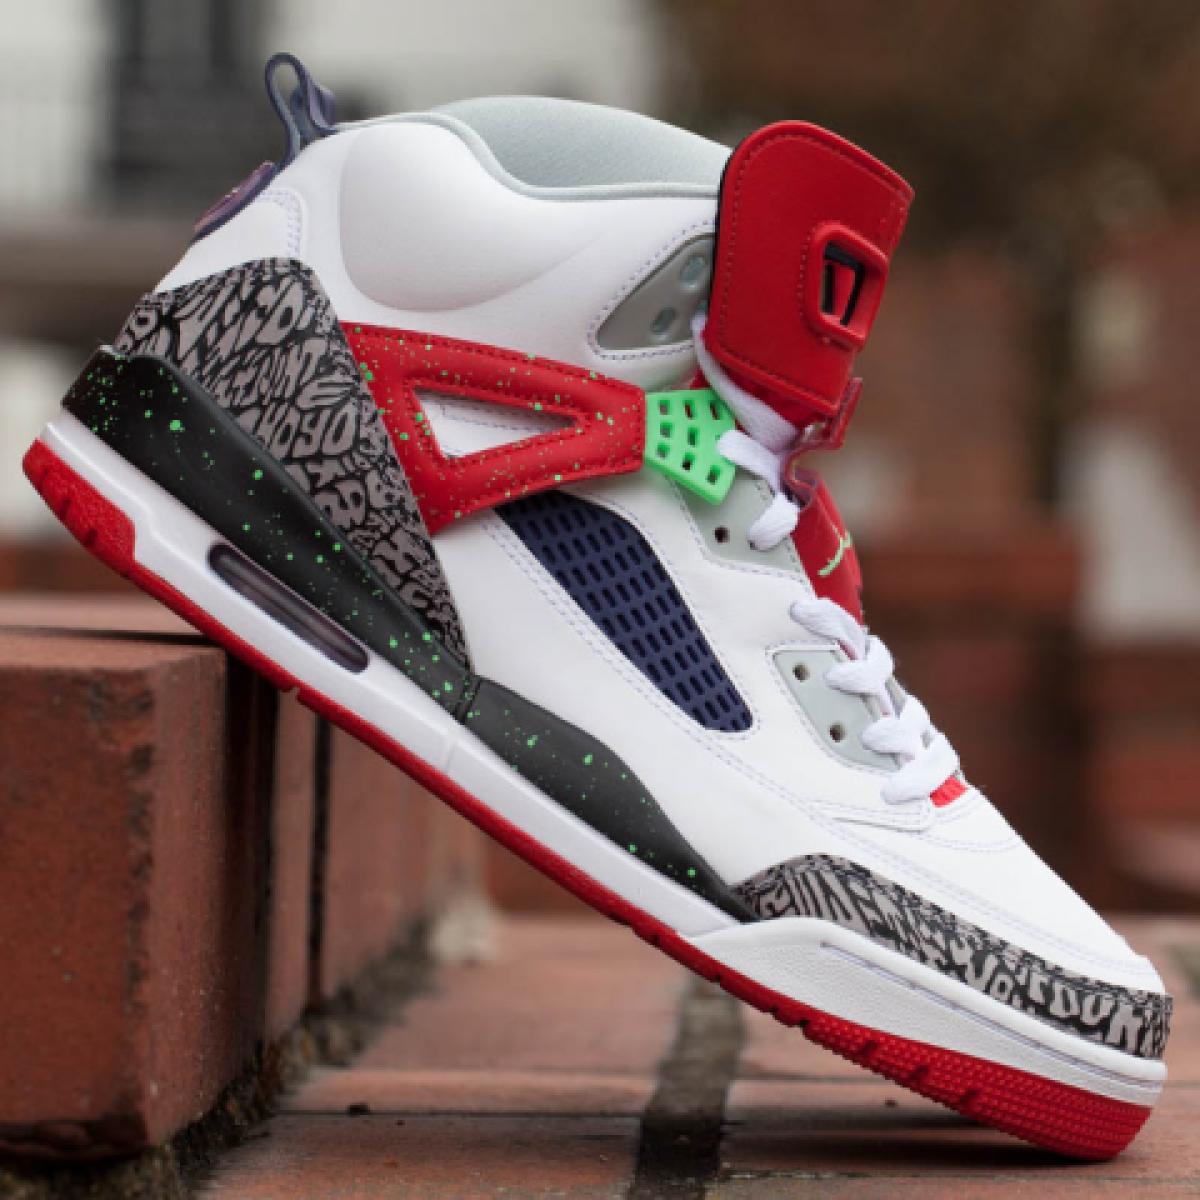 2015 Nike Air Jordan Spizike Retro Poison Green Size 13. 315371-132 1 2 3 4 5 6